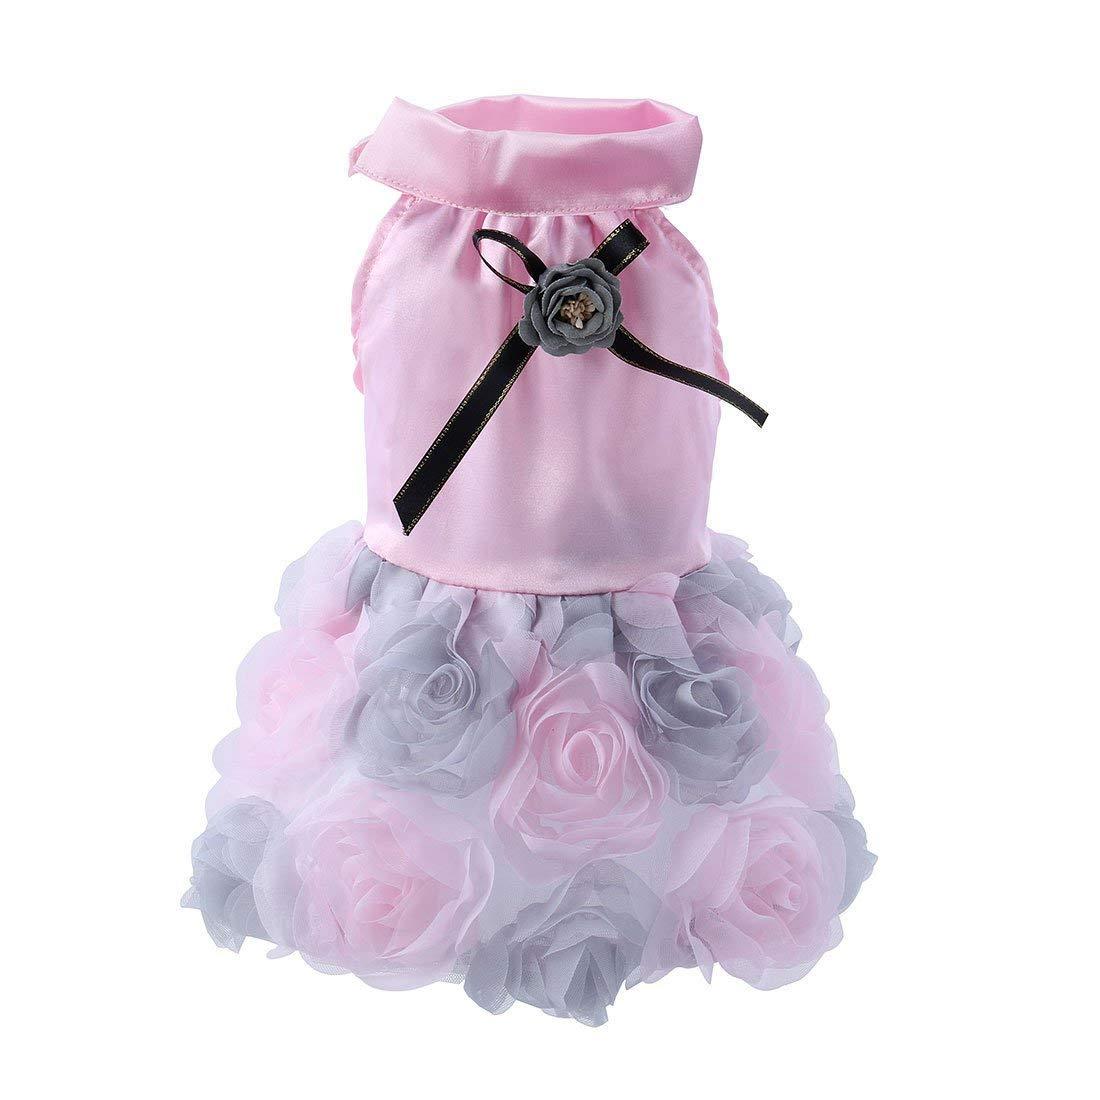 1Pc M, Pink   Fashion Floral Dog Dress Puppy Pet Tutu Dress Party Weddiong Dress